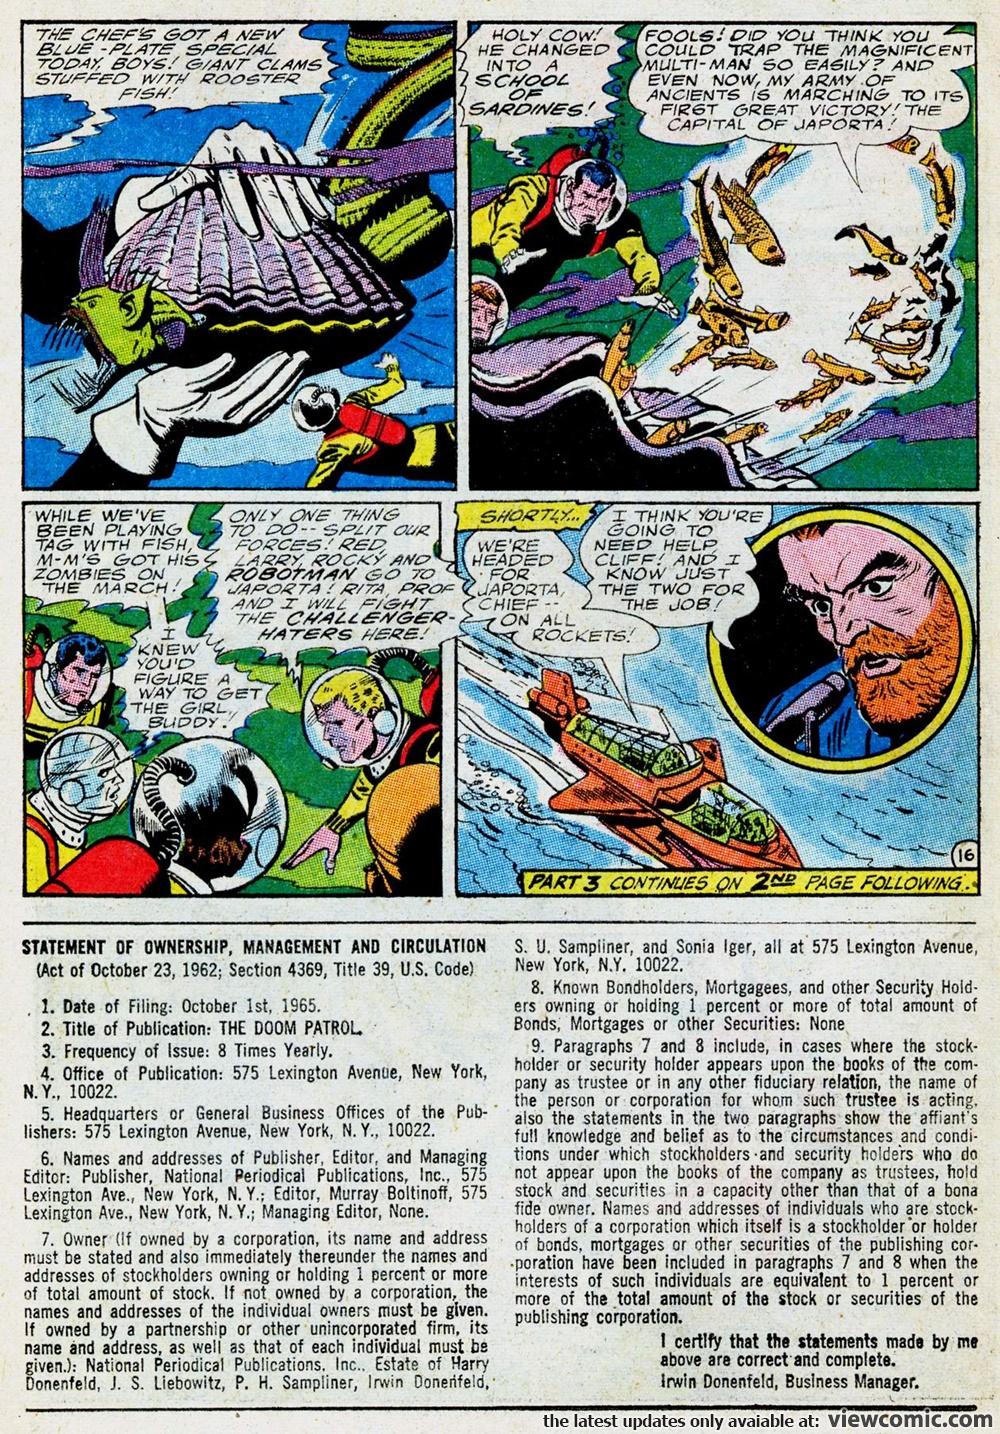 Doom Patrol v1 102b | Reading Comics Online For Free